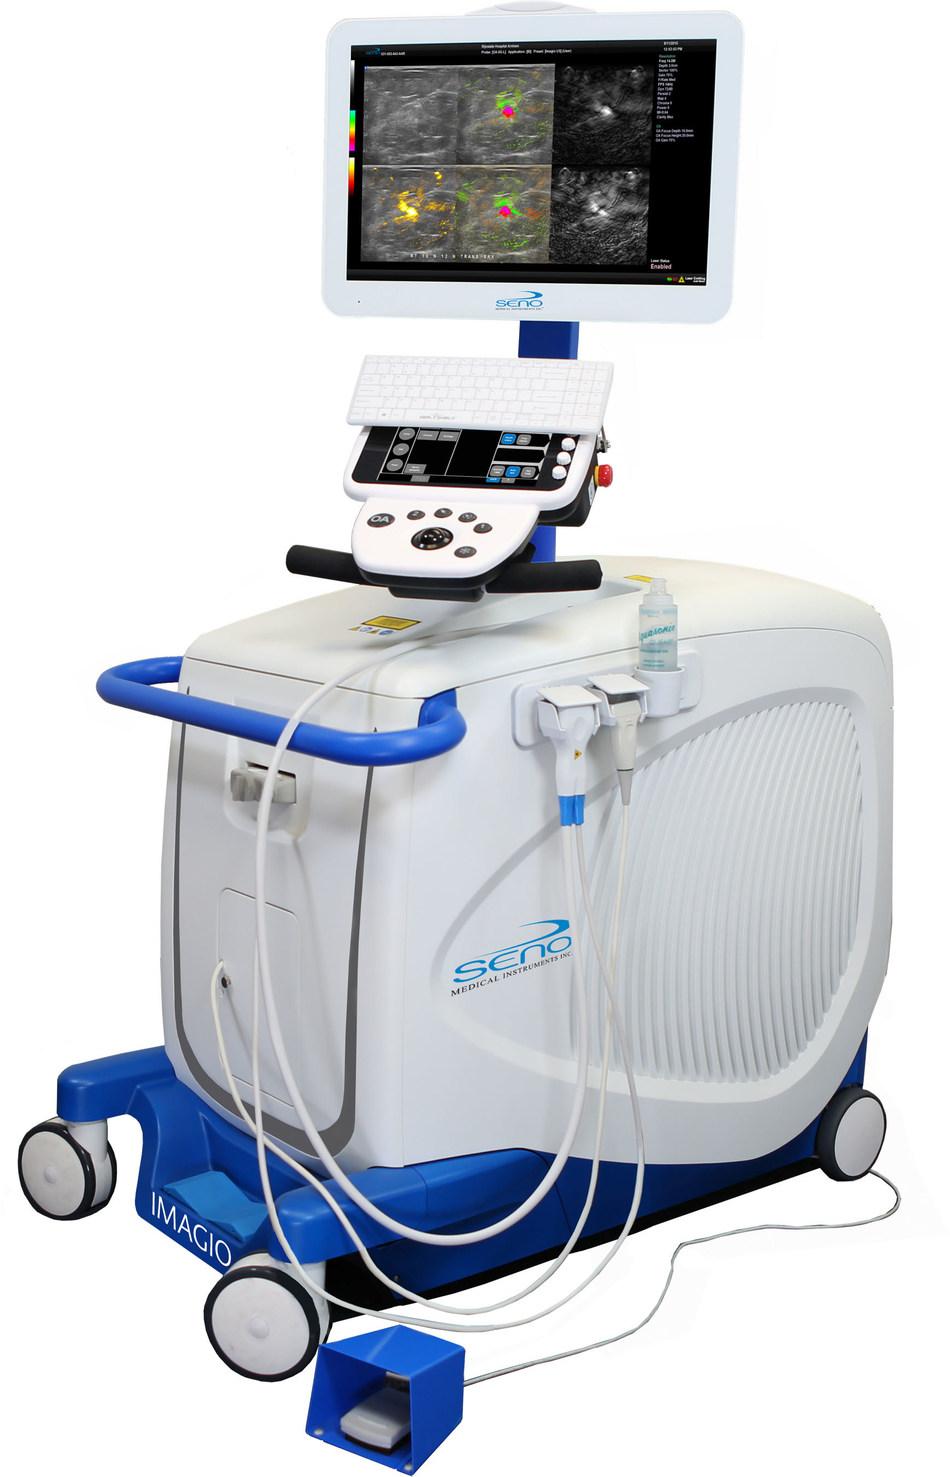 Imagio™ Opto-Acoustic Breast Imaging System (PRNewsfoto/Seno Medical Instruments, Inc.)